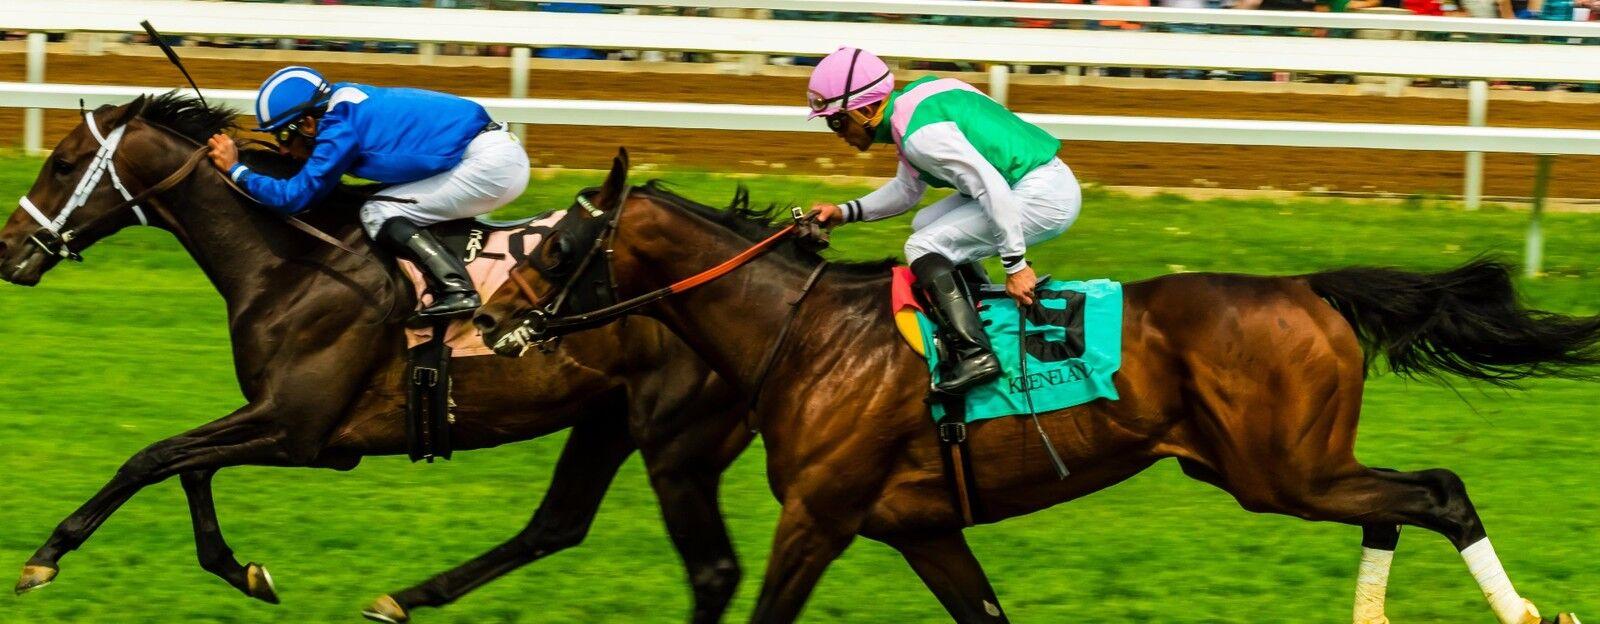 horse racing trivia uk